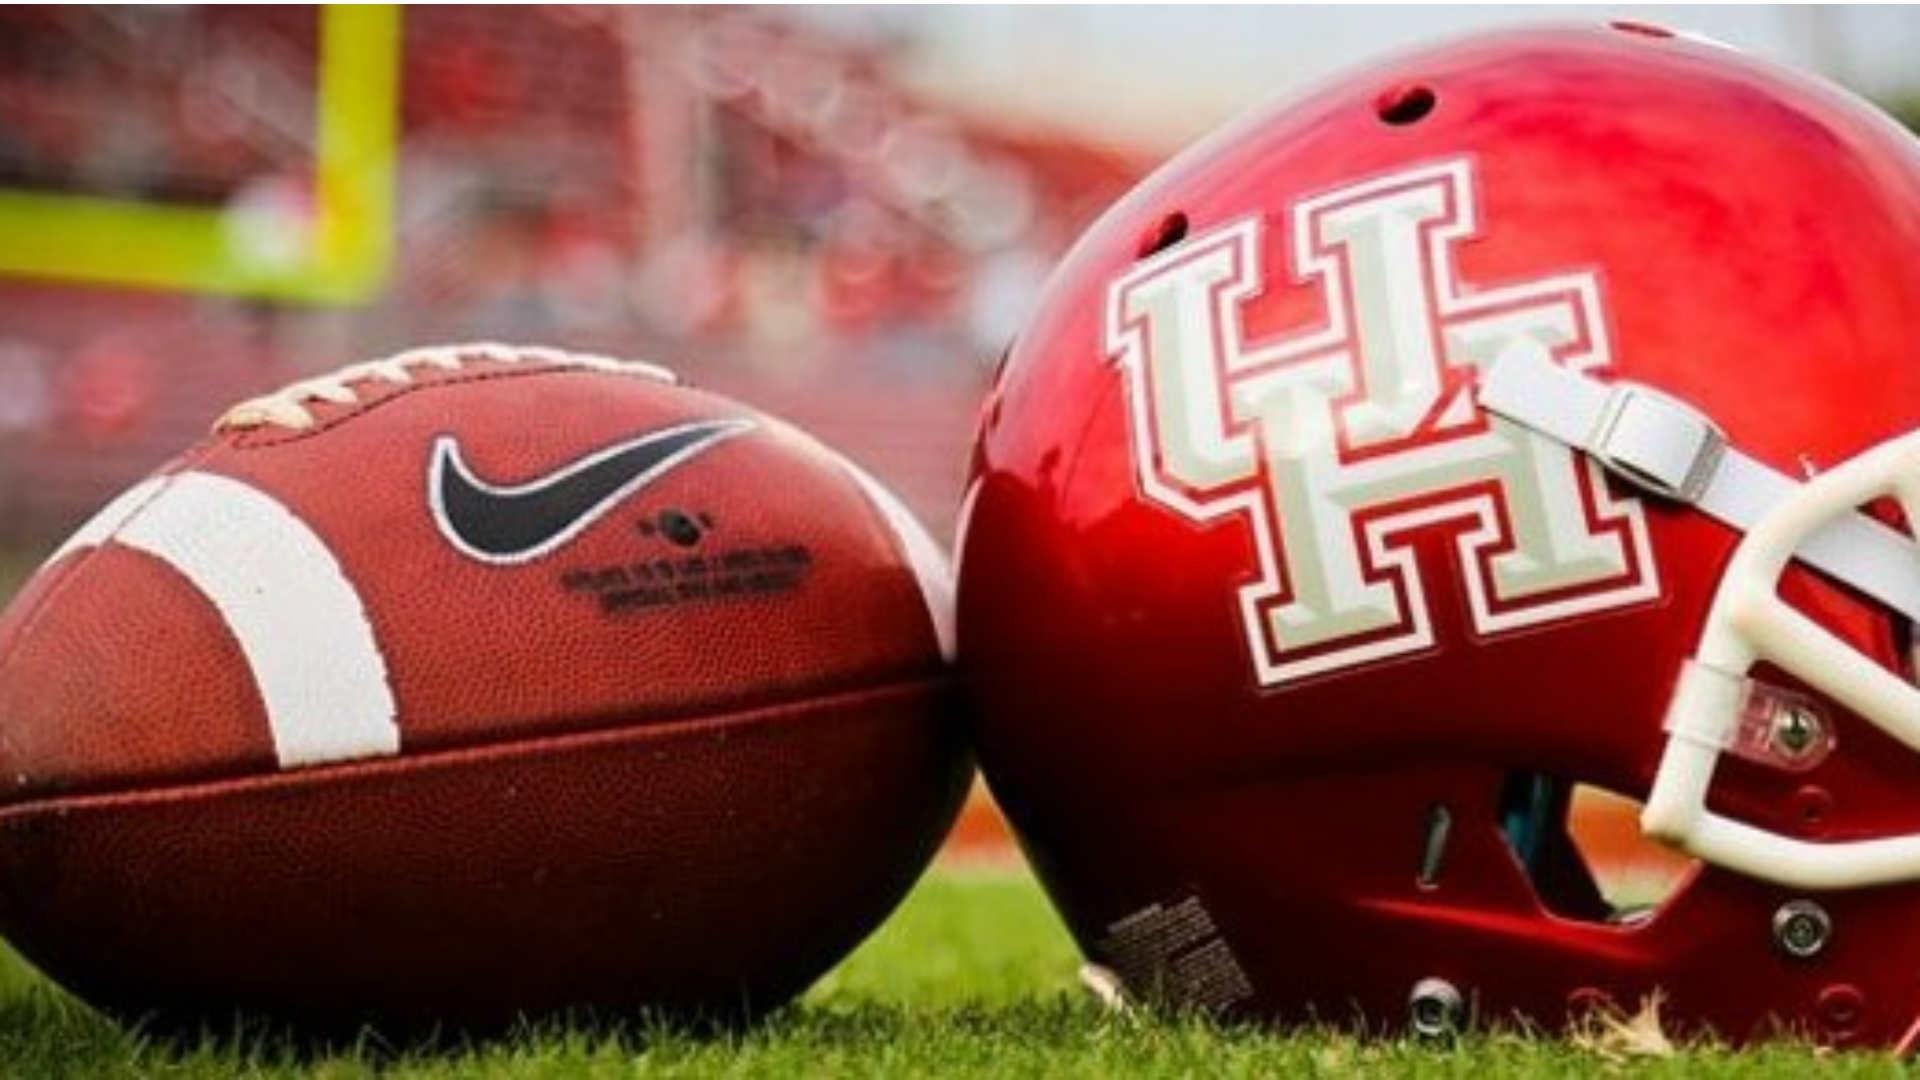 Five-star recruit picks Houston over Alabama, Texas, Texas A&M